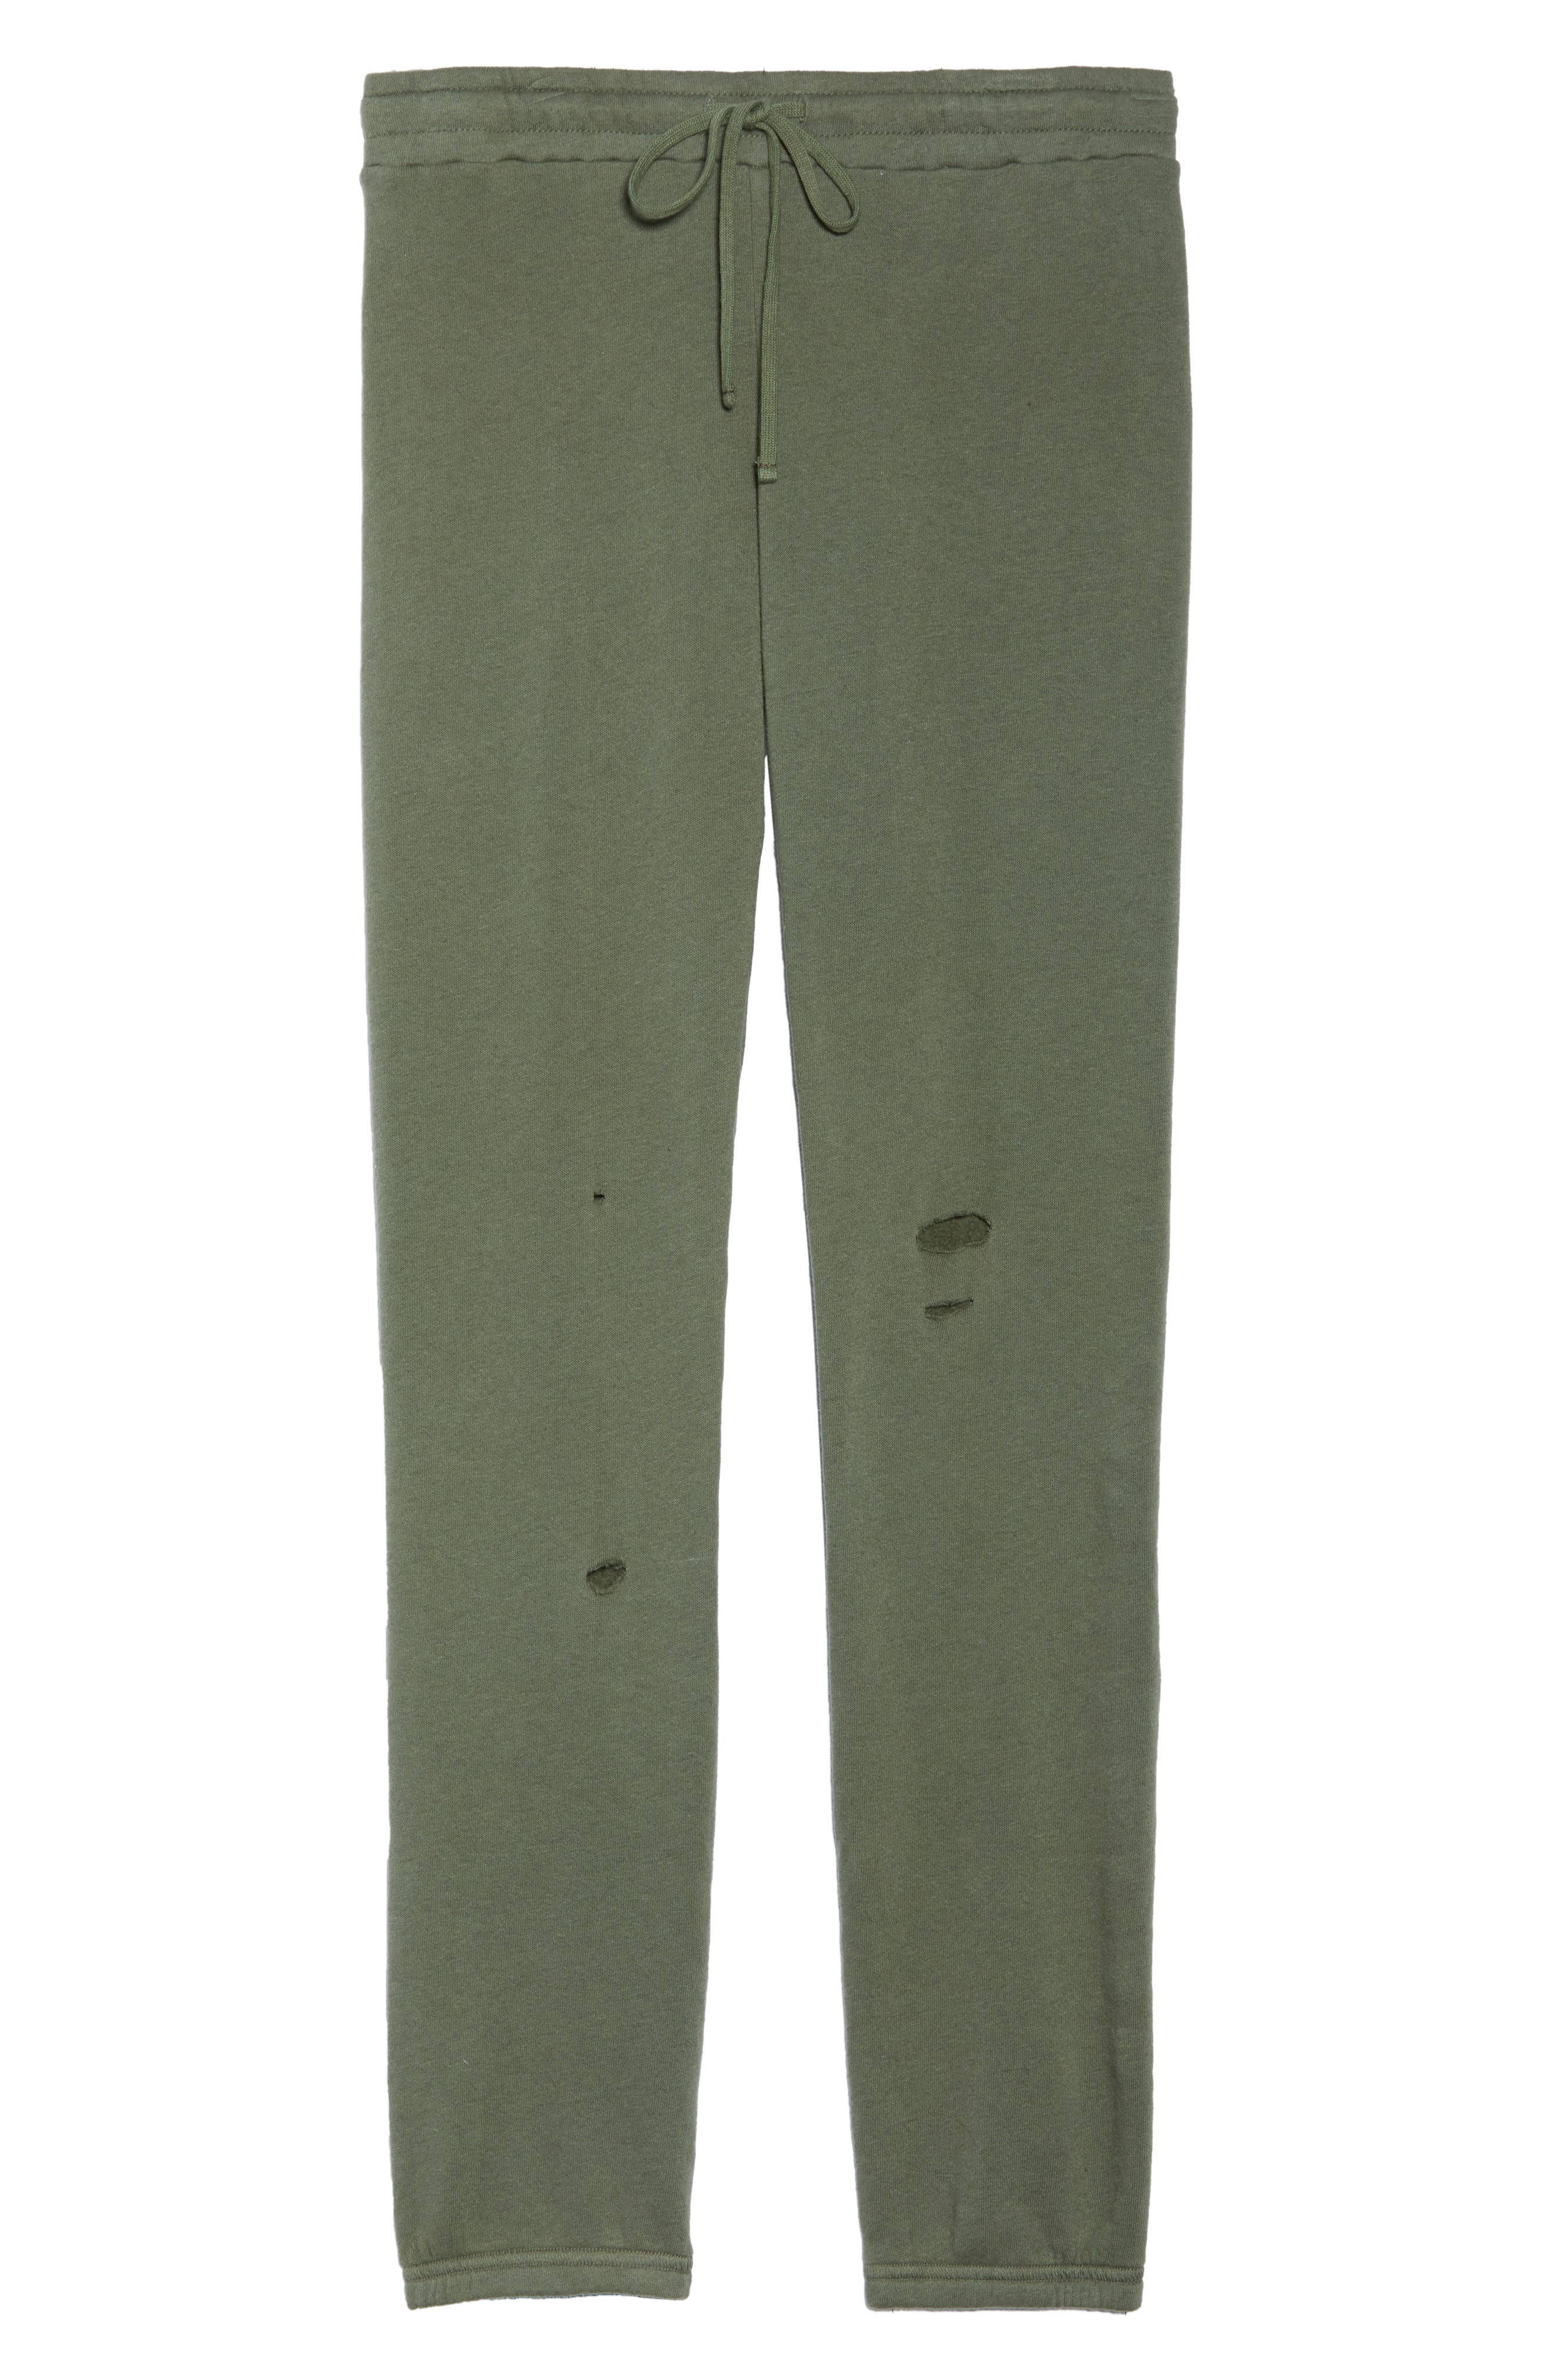 Destroyed Jogger Pants,                             Alternate thumbnail 6, color,                             Palm